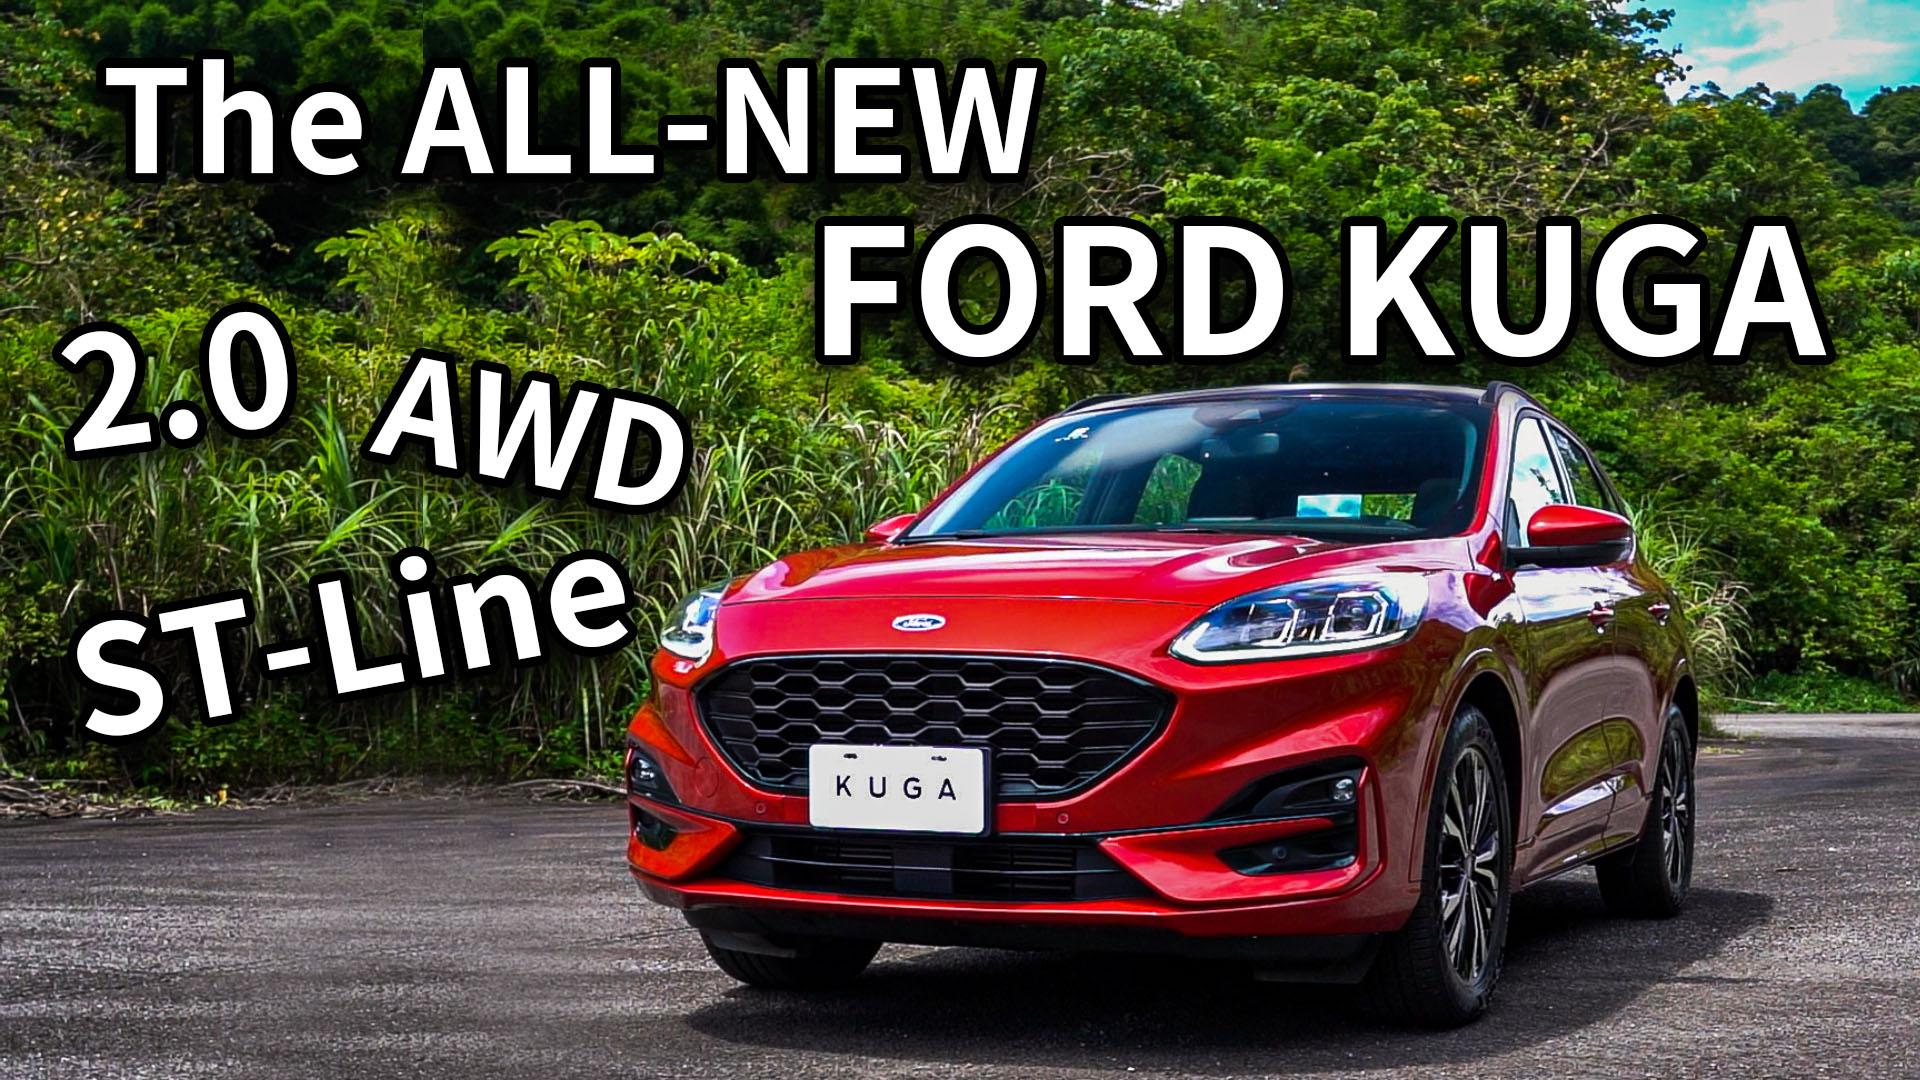 【Money錢毅試駕】國產跑旅!!配備上滿!FORD KUGA 250 AWD ST-Line  Ford Kuga大改款導入